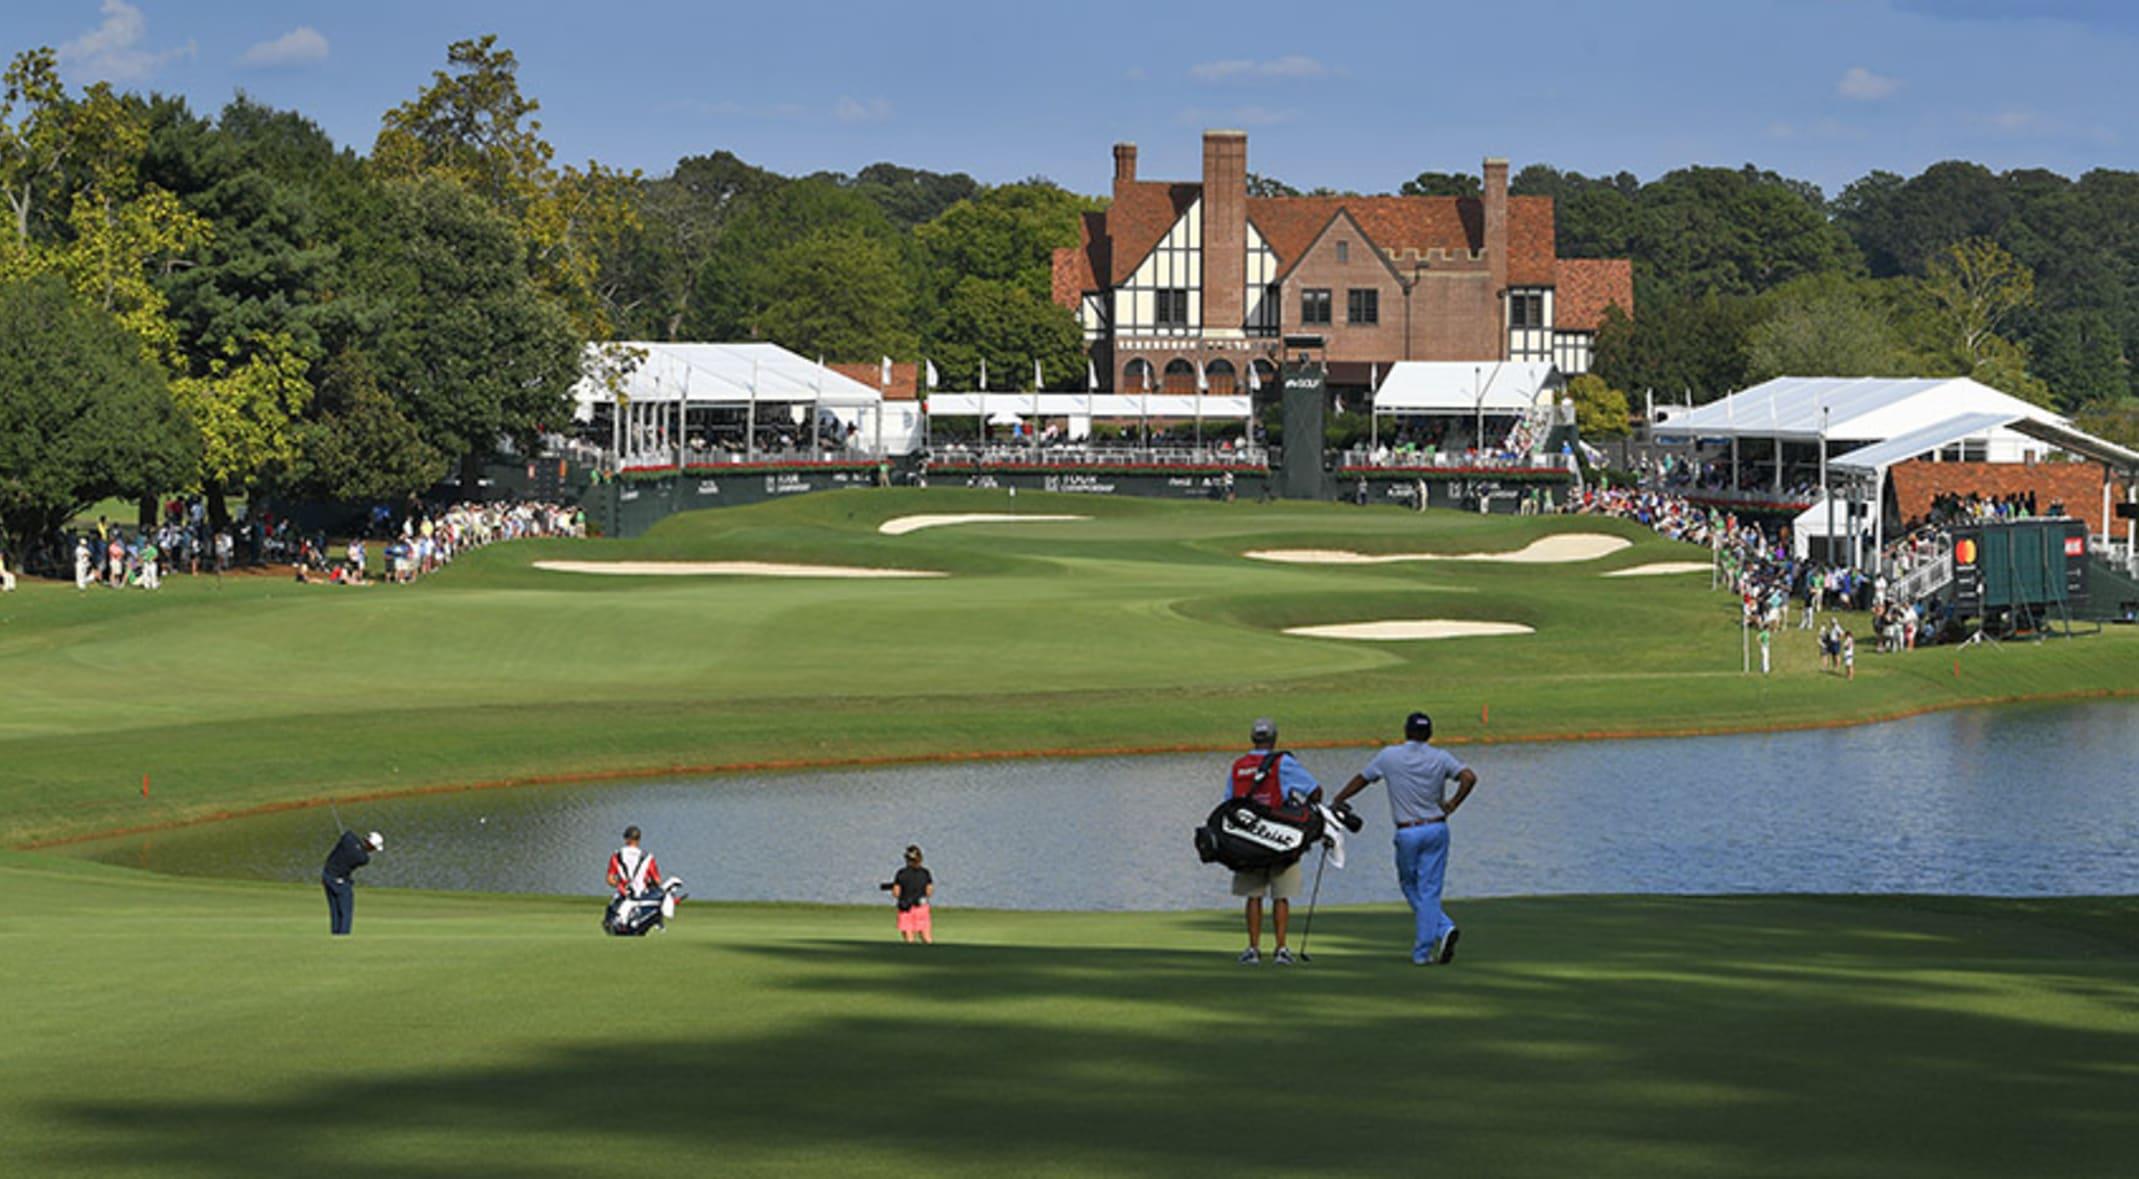 El East Lake Golf Club, en Georgia, donde se jugará el Tour Championship.